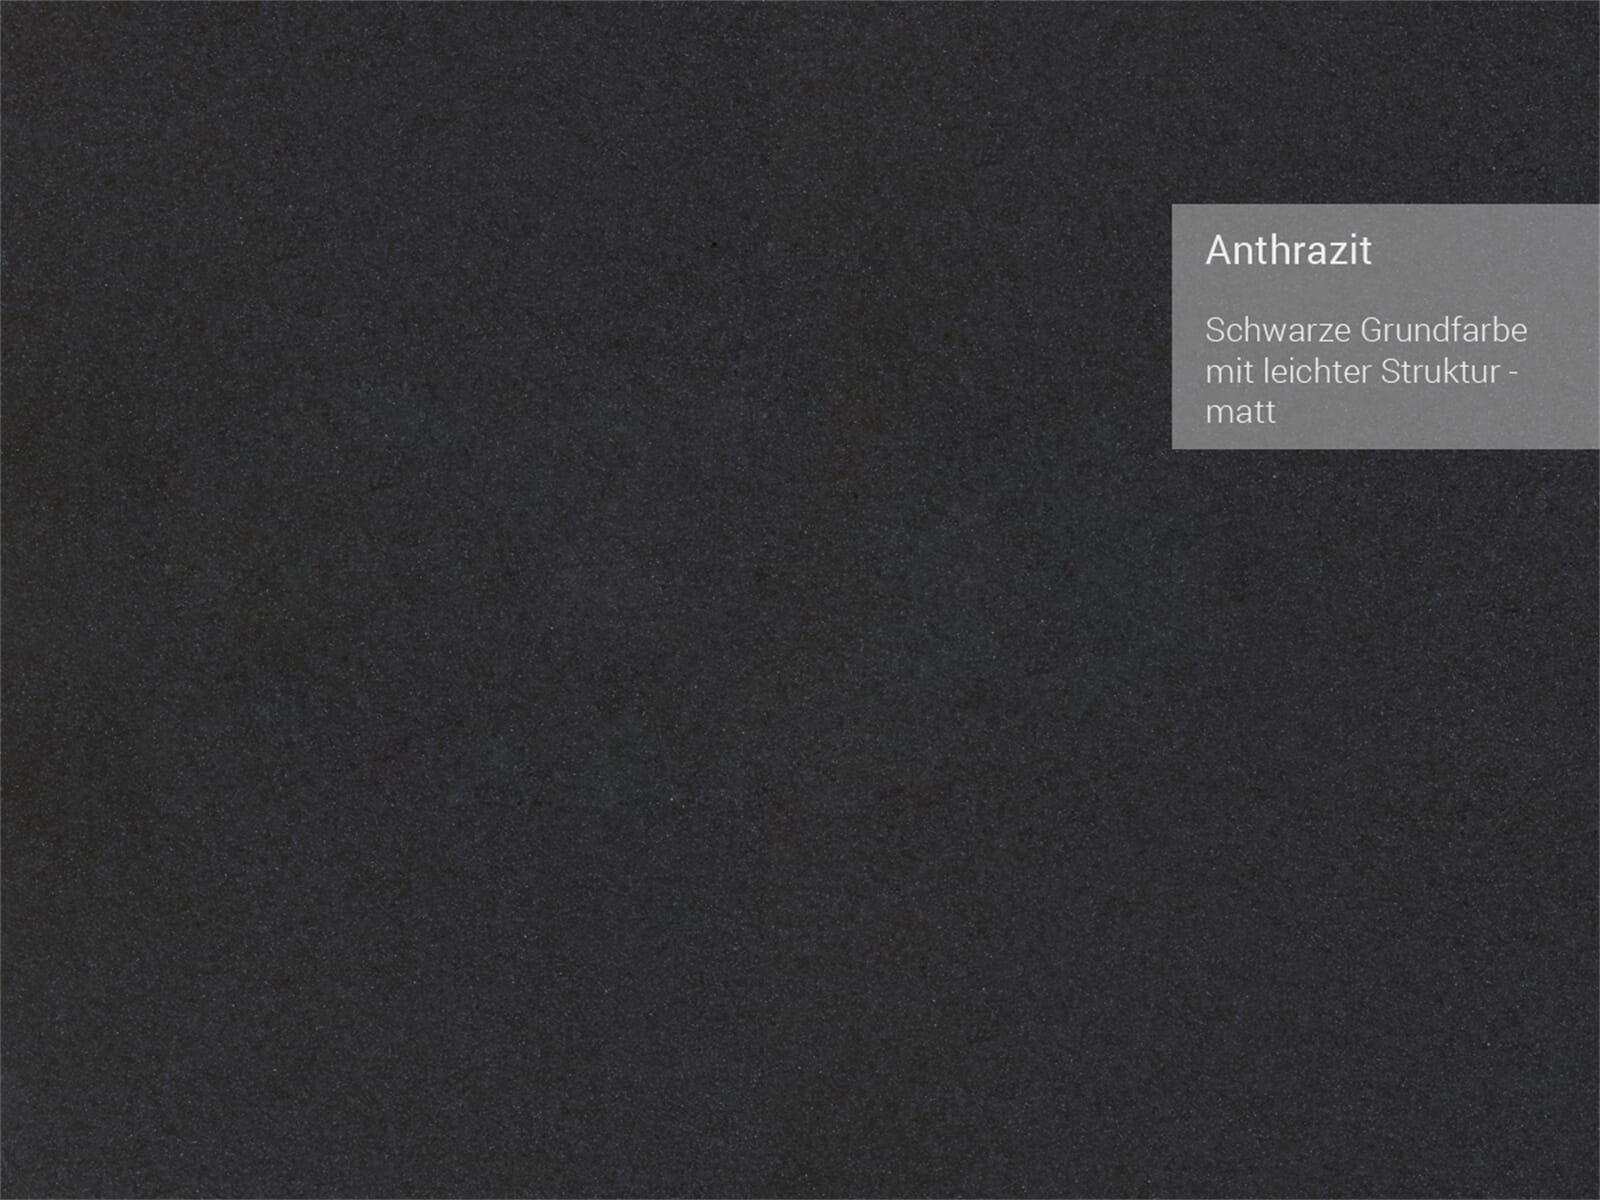 Franke Ambion ABK 611-100 Anthrazit matt - 10629 Keramikspüle Exzenterbetätigung